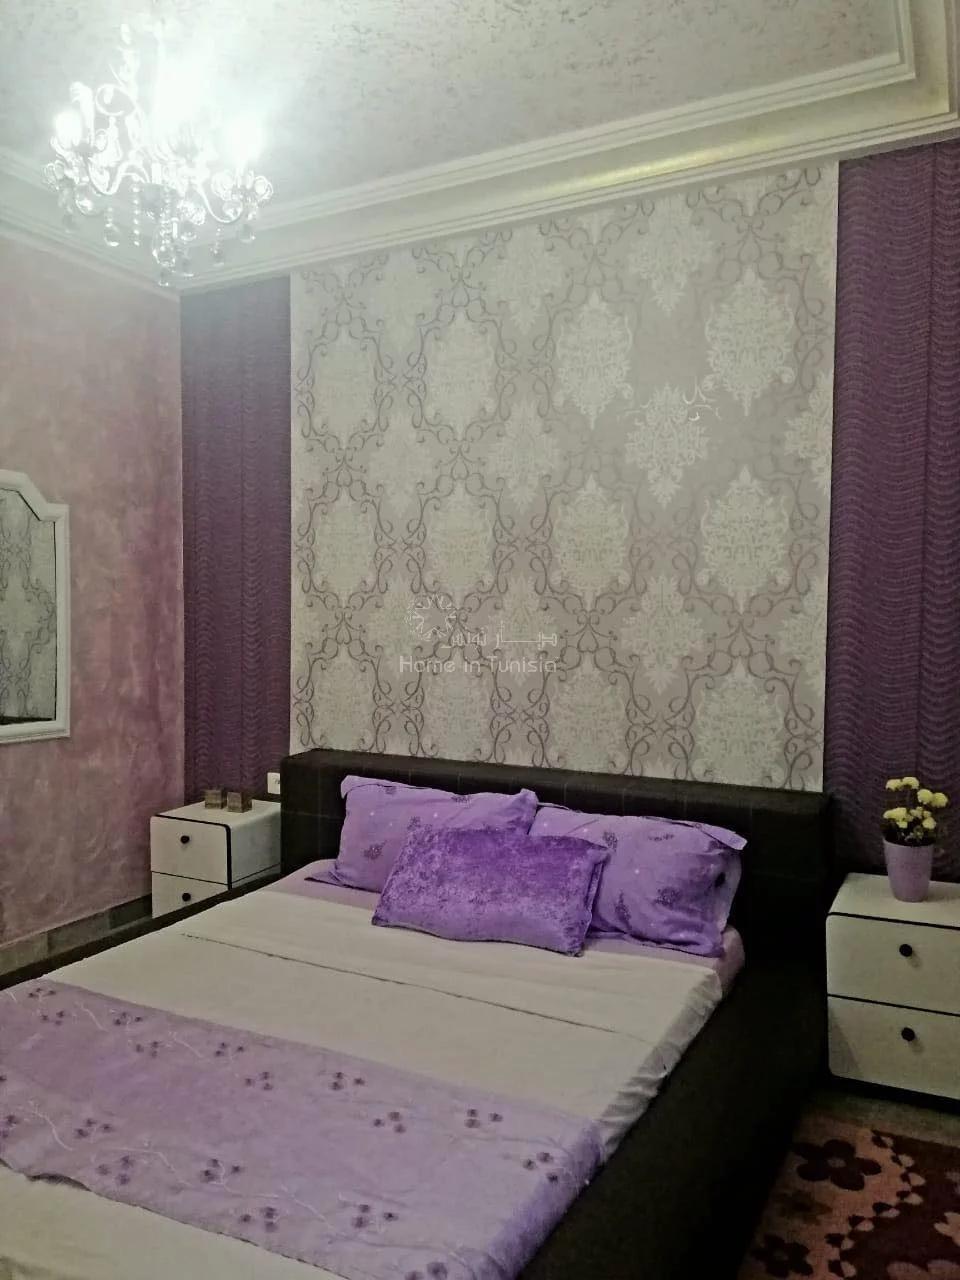 Huur Appartement - Monastir - Tunesië